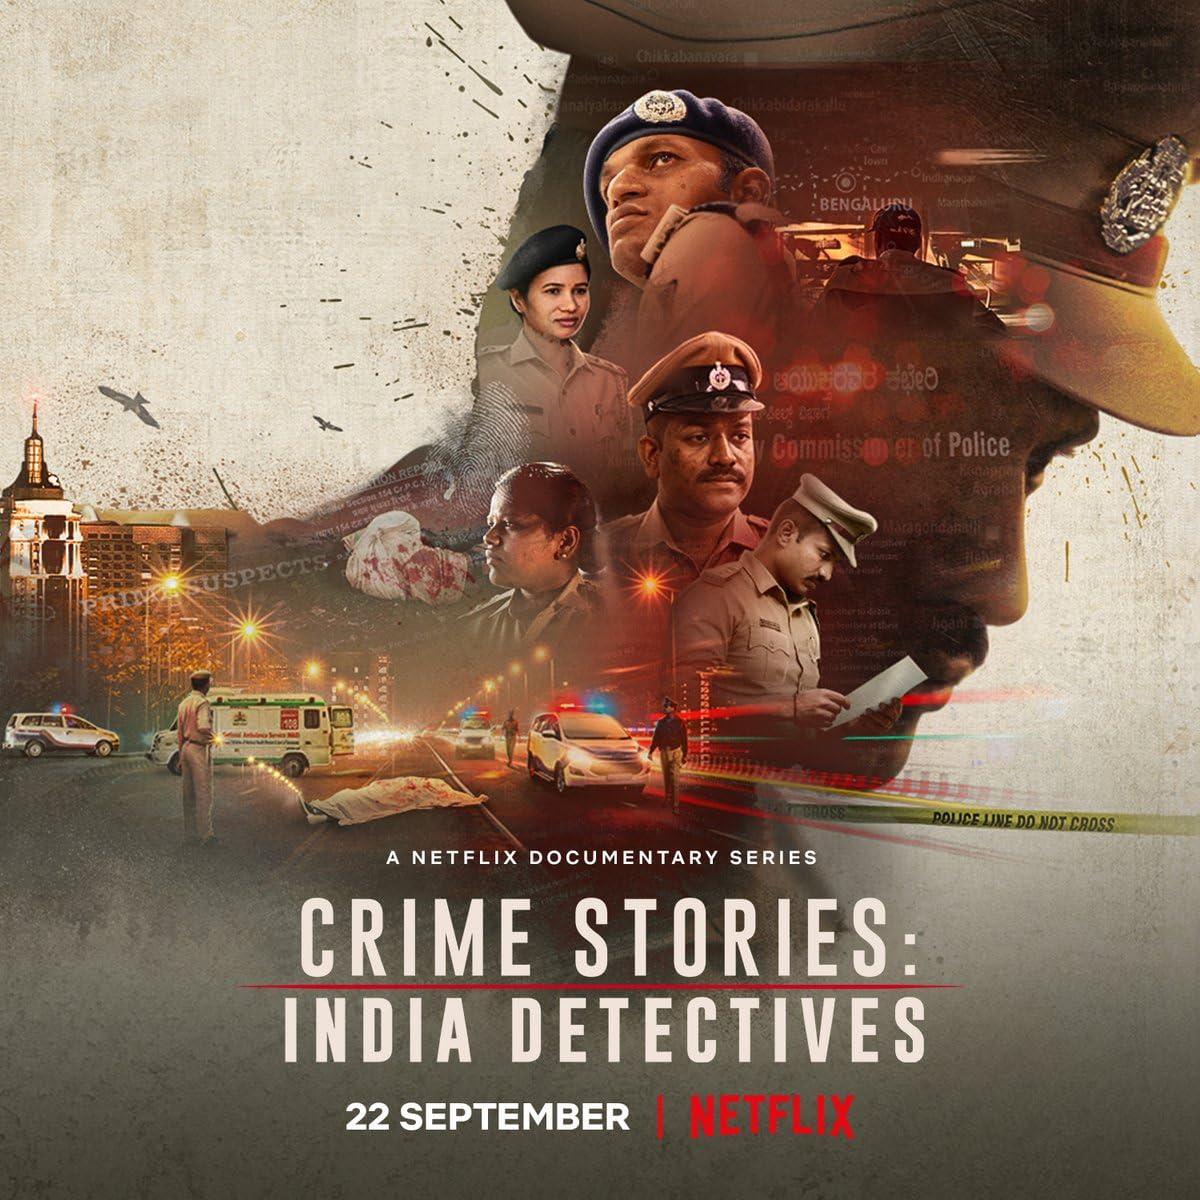 Crime Stories: India Detectives (2021) Season 1 Hindi Dubbed (Netflix)